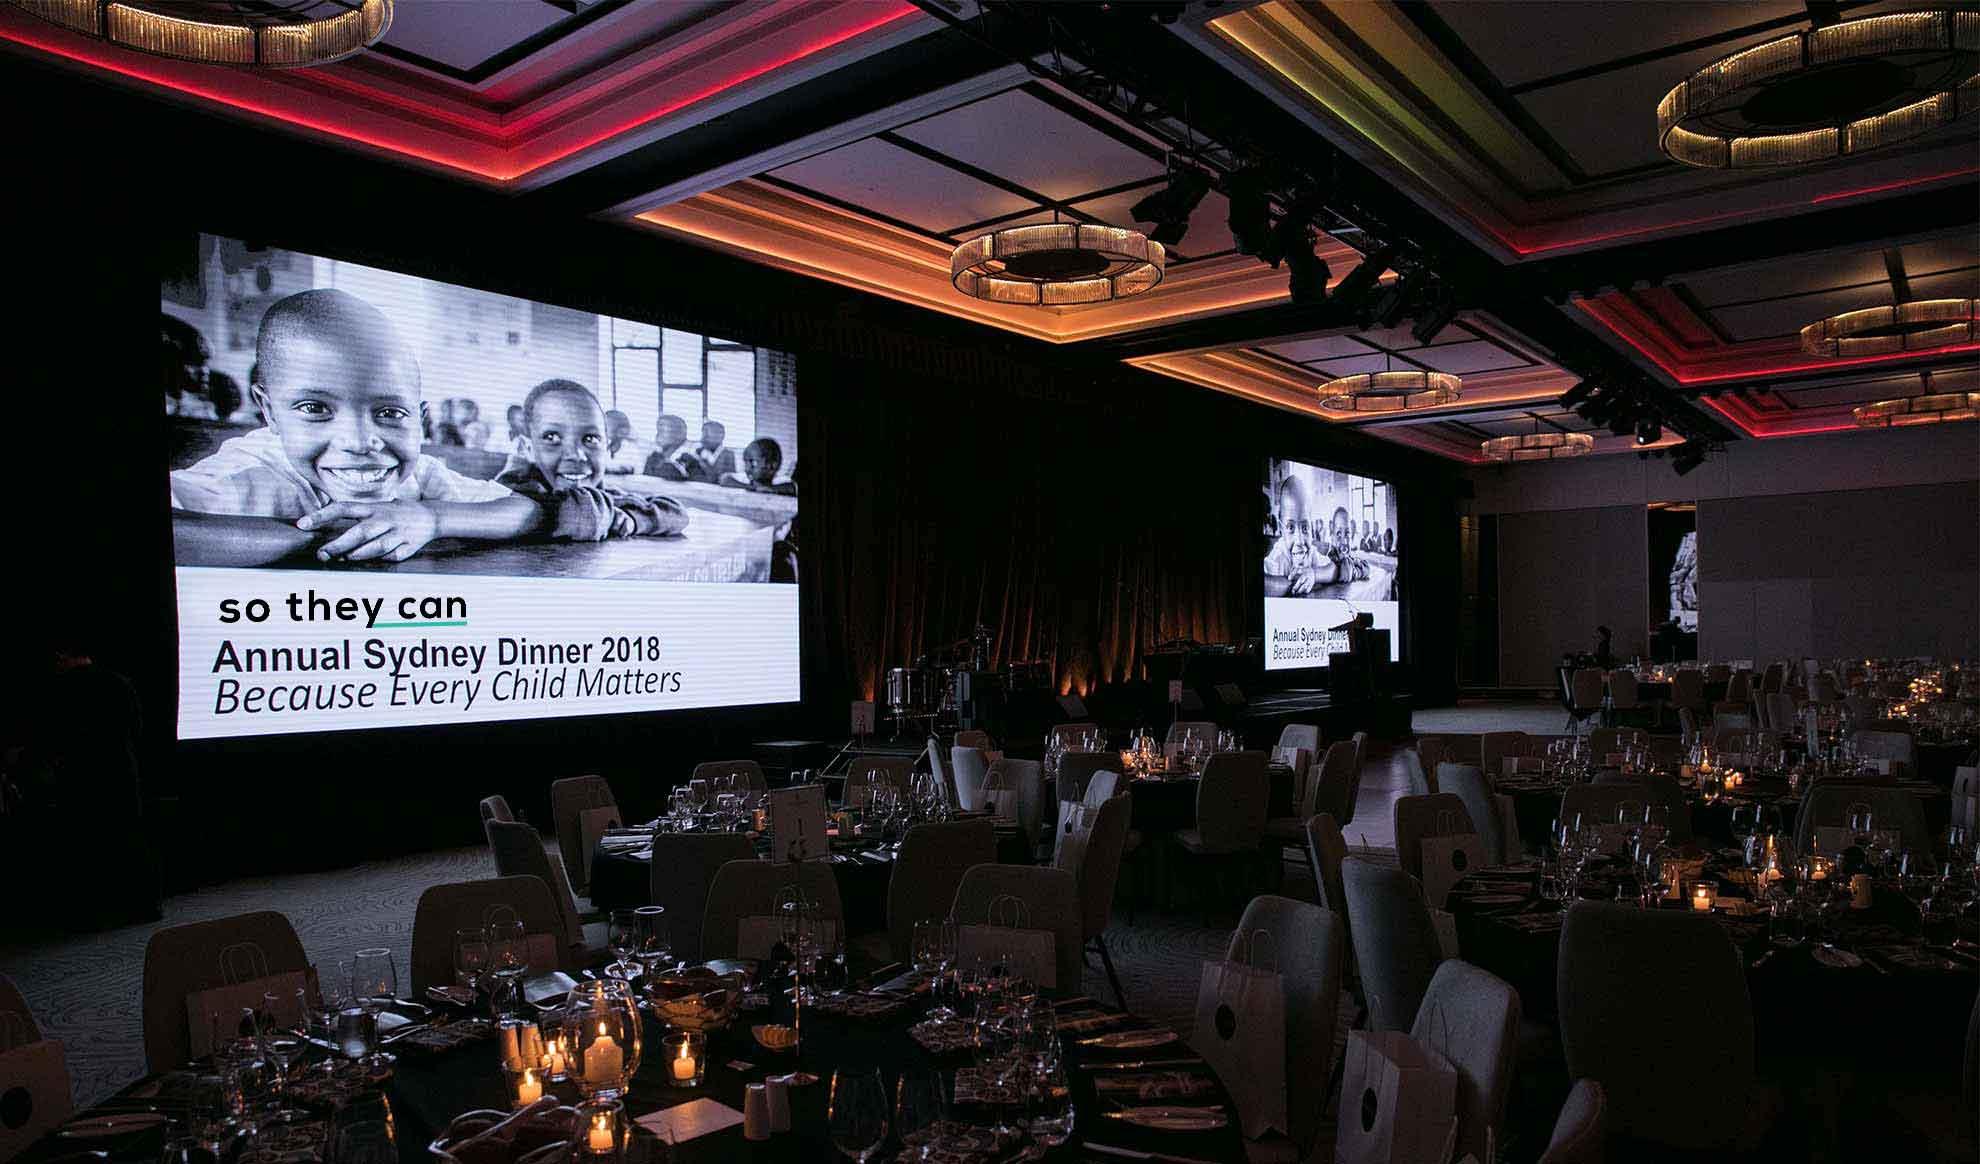 So They Can | Annual Sydney Dinner